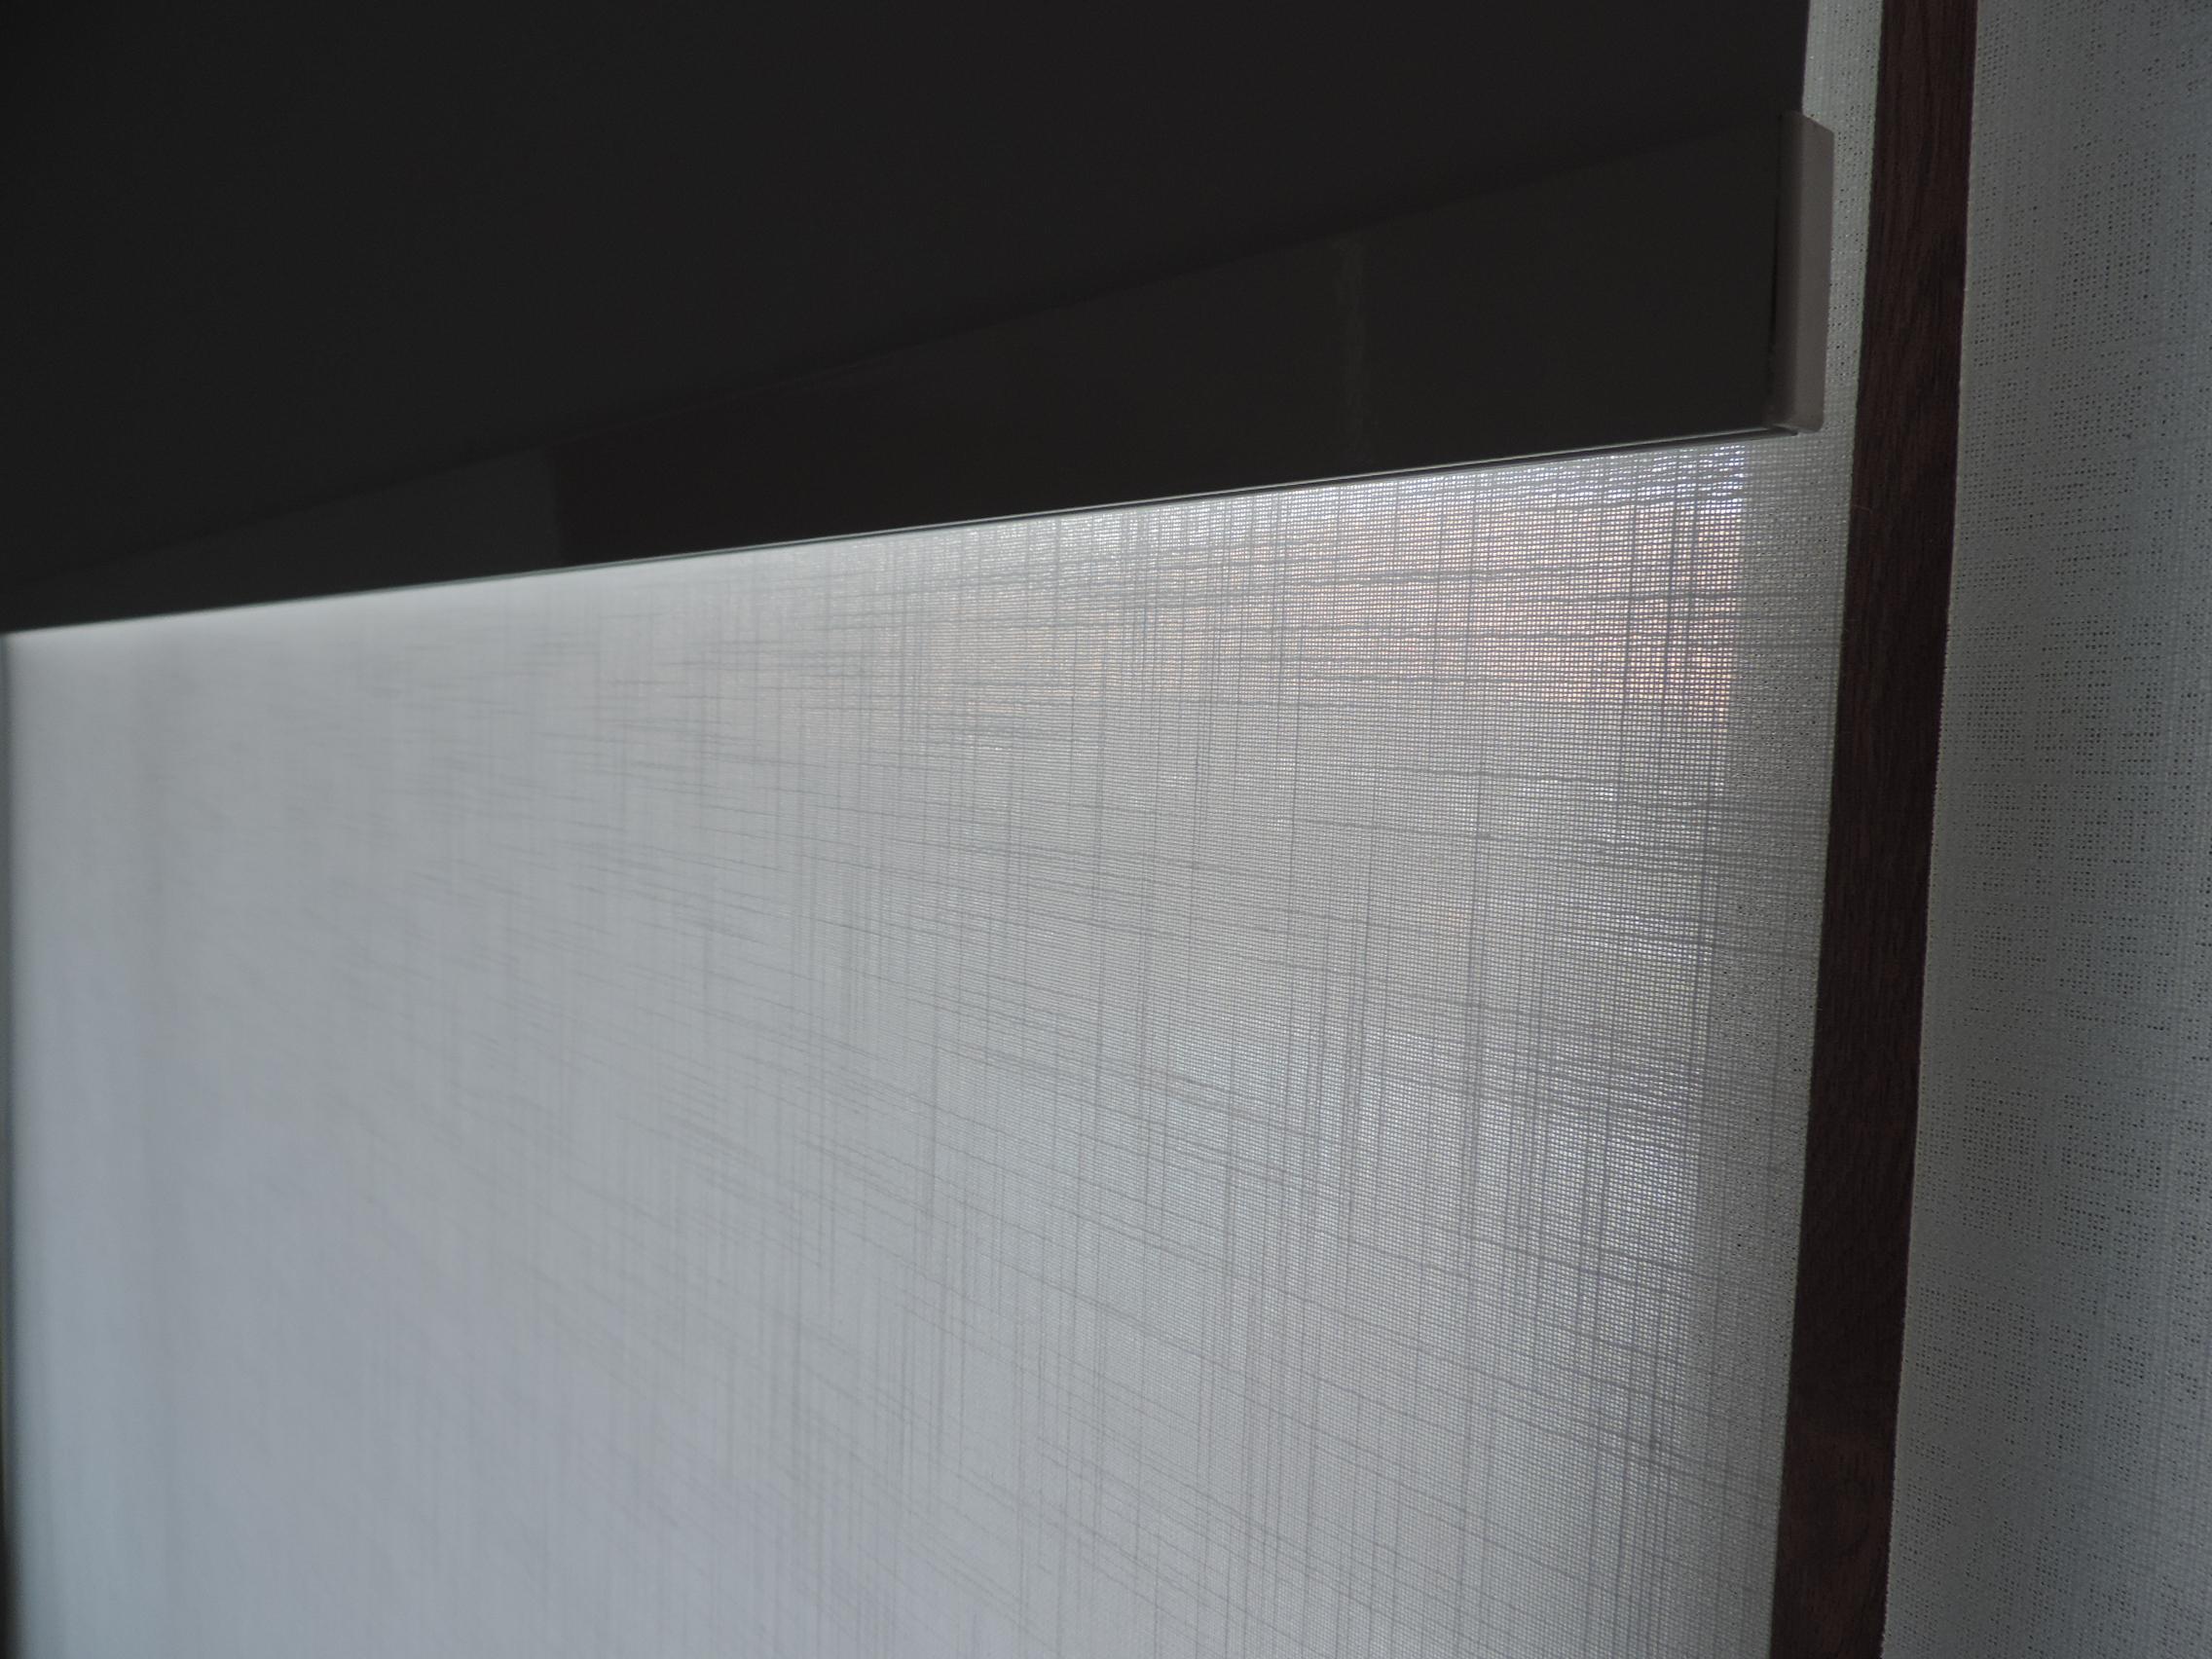 detalle tela roller traslucido